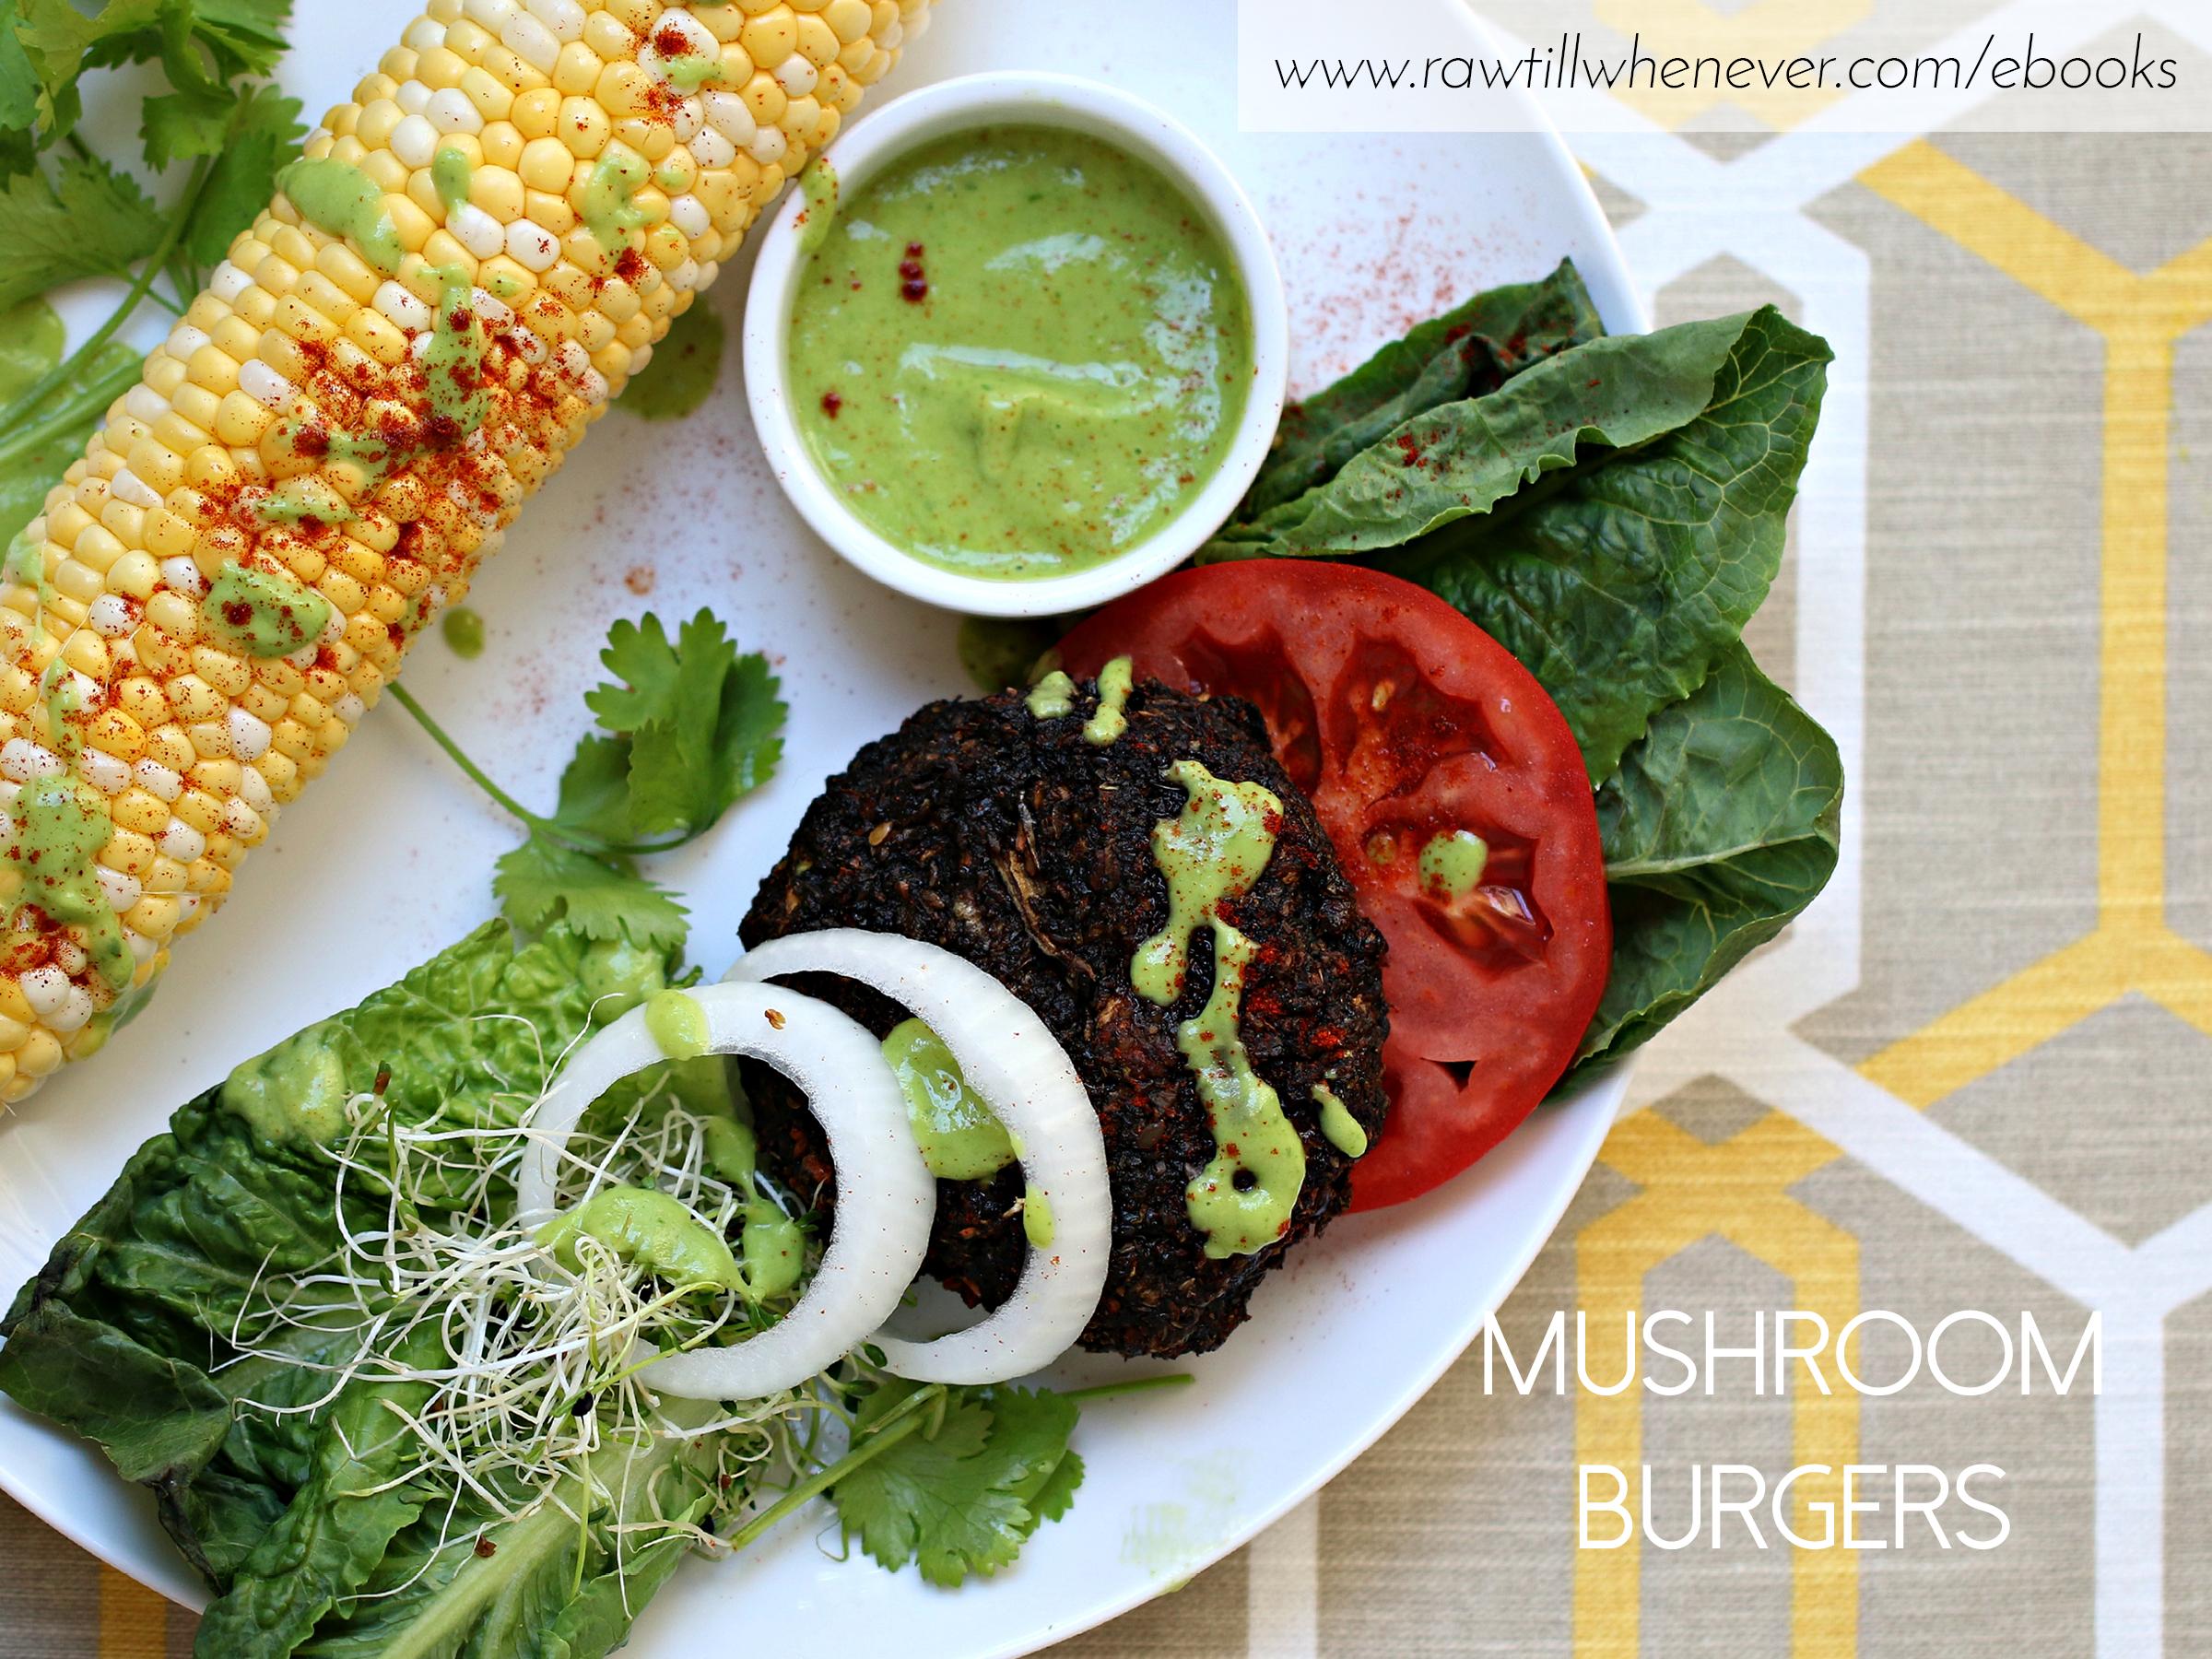 Mushroom burgers recipe featured from my raw vegan recipe book mushroom burgers recipe featured from my raw vegan recipe book ilikeitraw forumfinder Choice Image